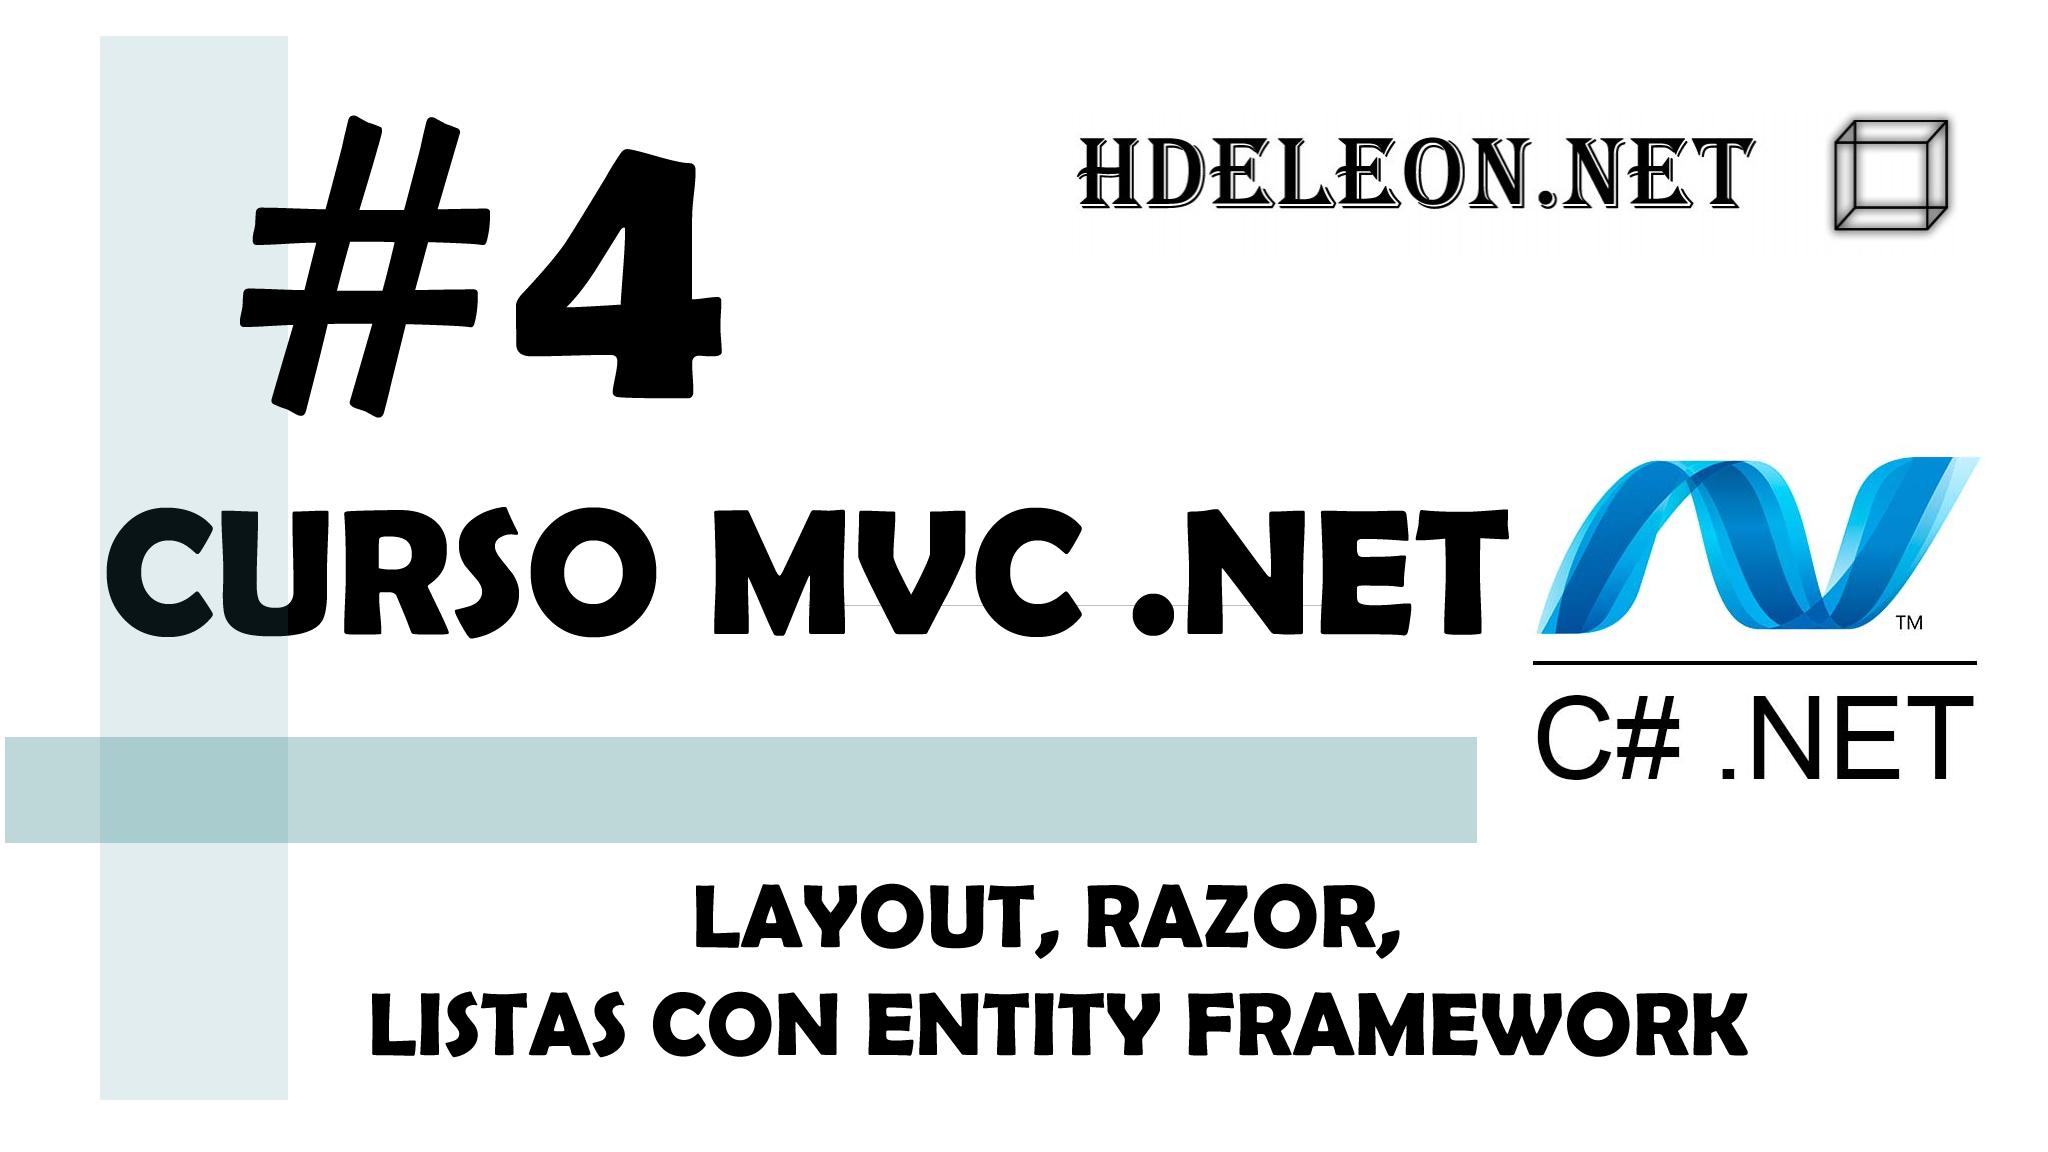 Curso de MVC .Net C#, Layout, Razor, Listas con EntityFramework #4